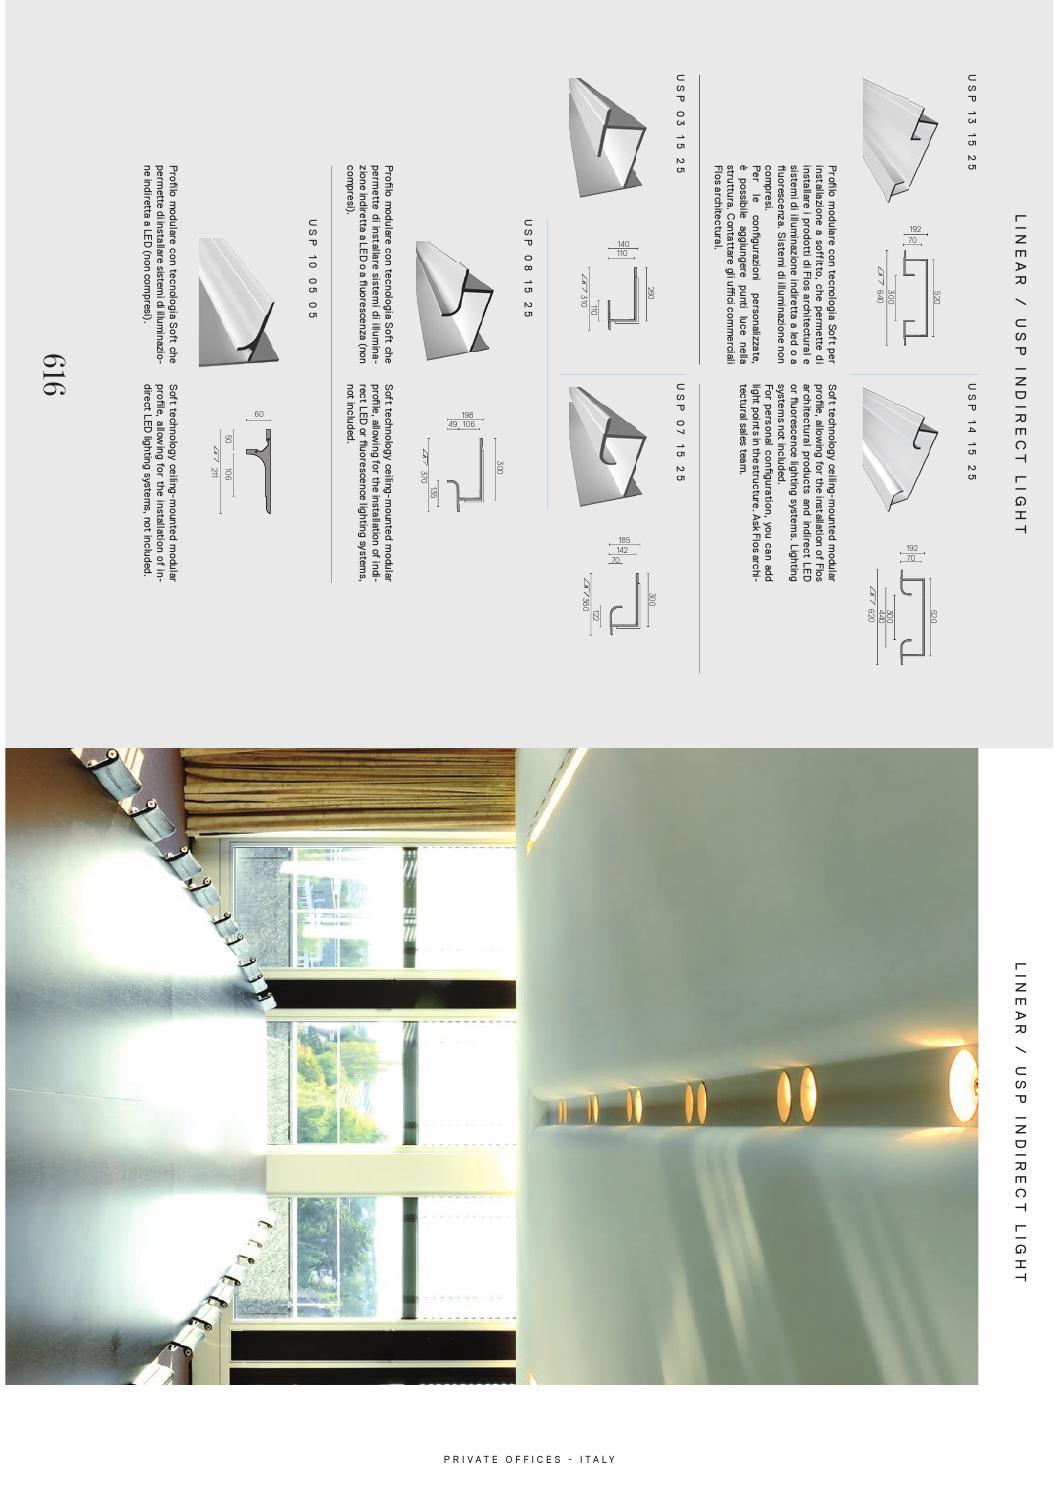 Sistemi Di Illuminazione A Led flos arch collection 2015 by lampard - issuu